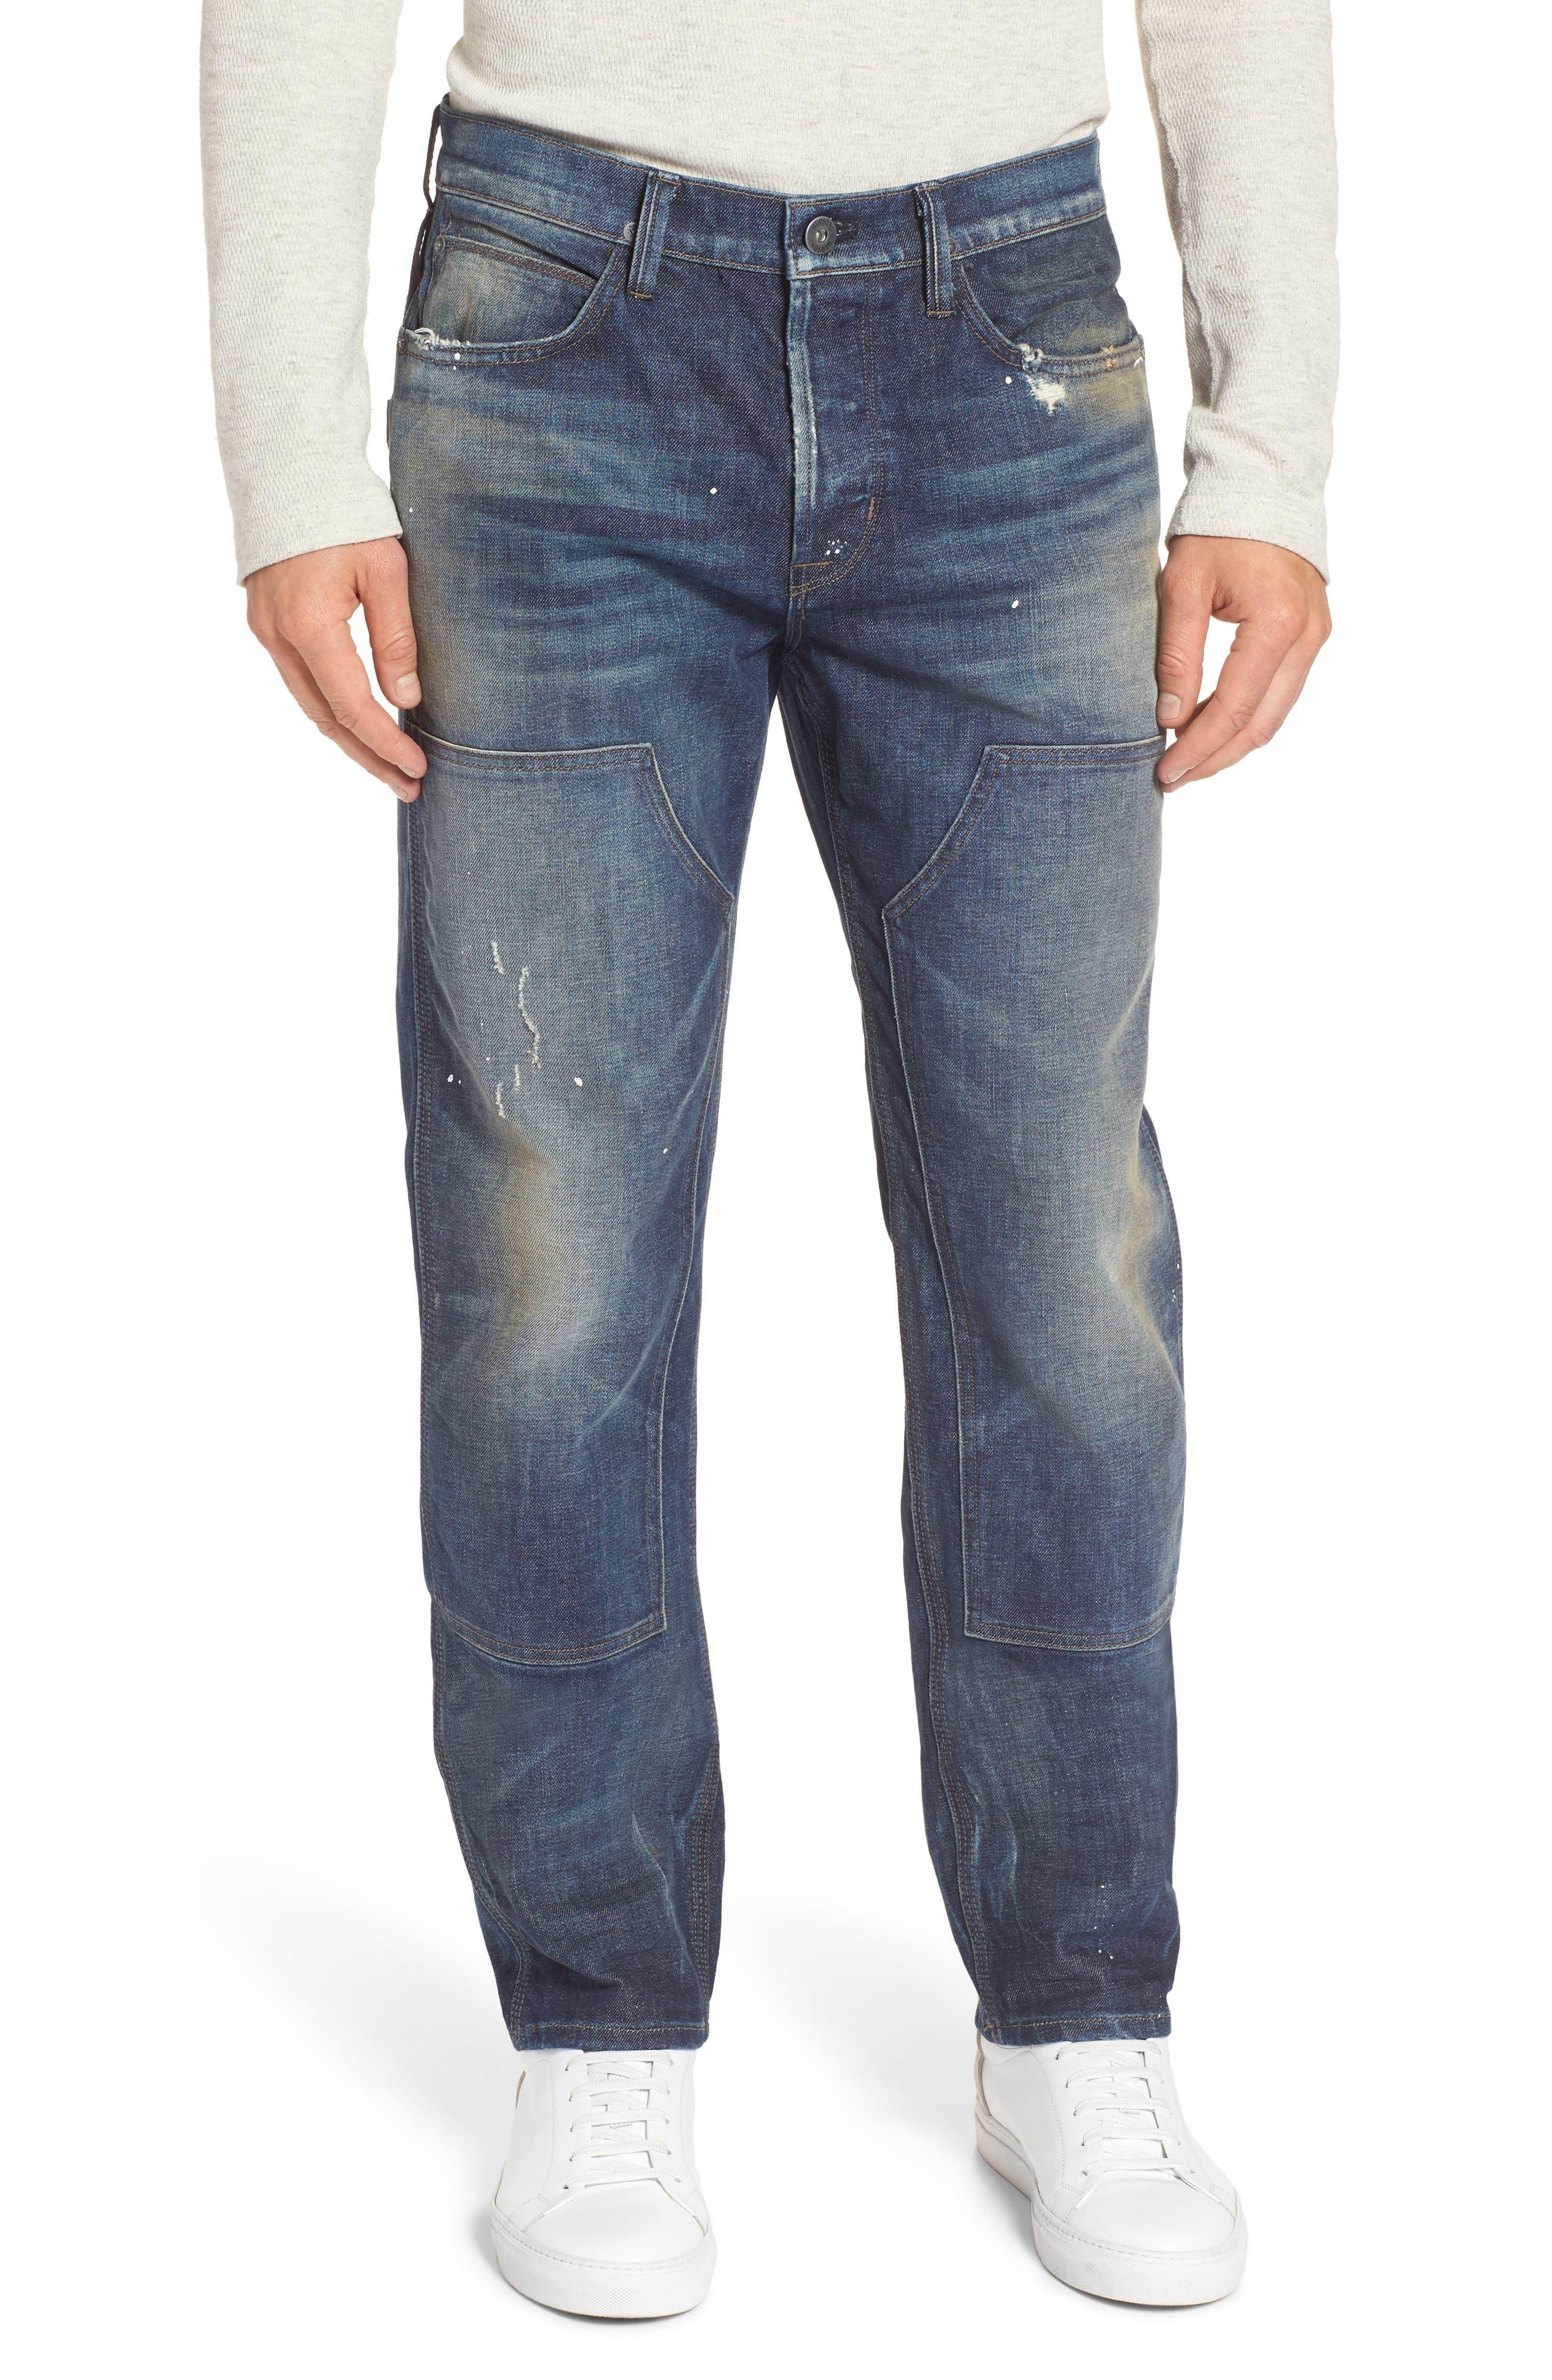 Alternate Image 1 Selected - Hudson Jeans Hunter Straight Fit Jeans (Virus)